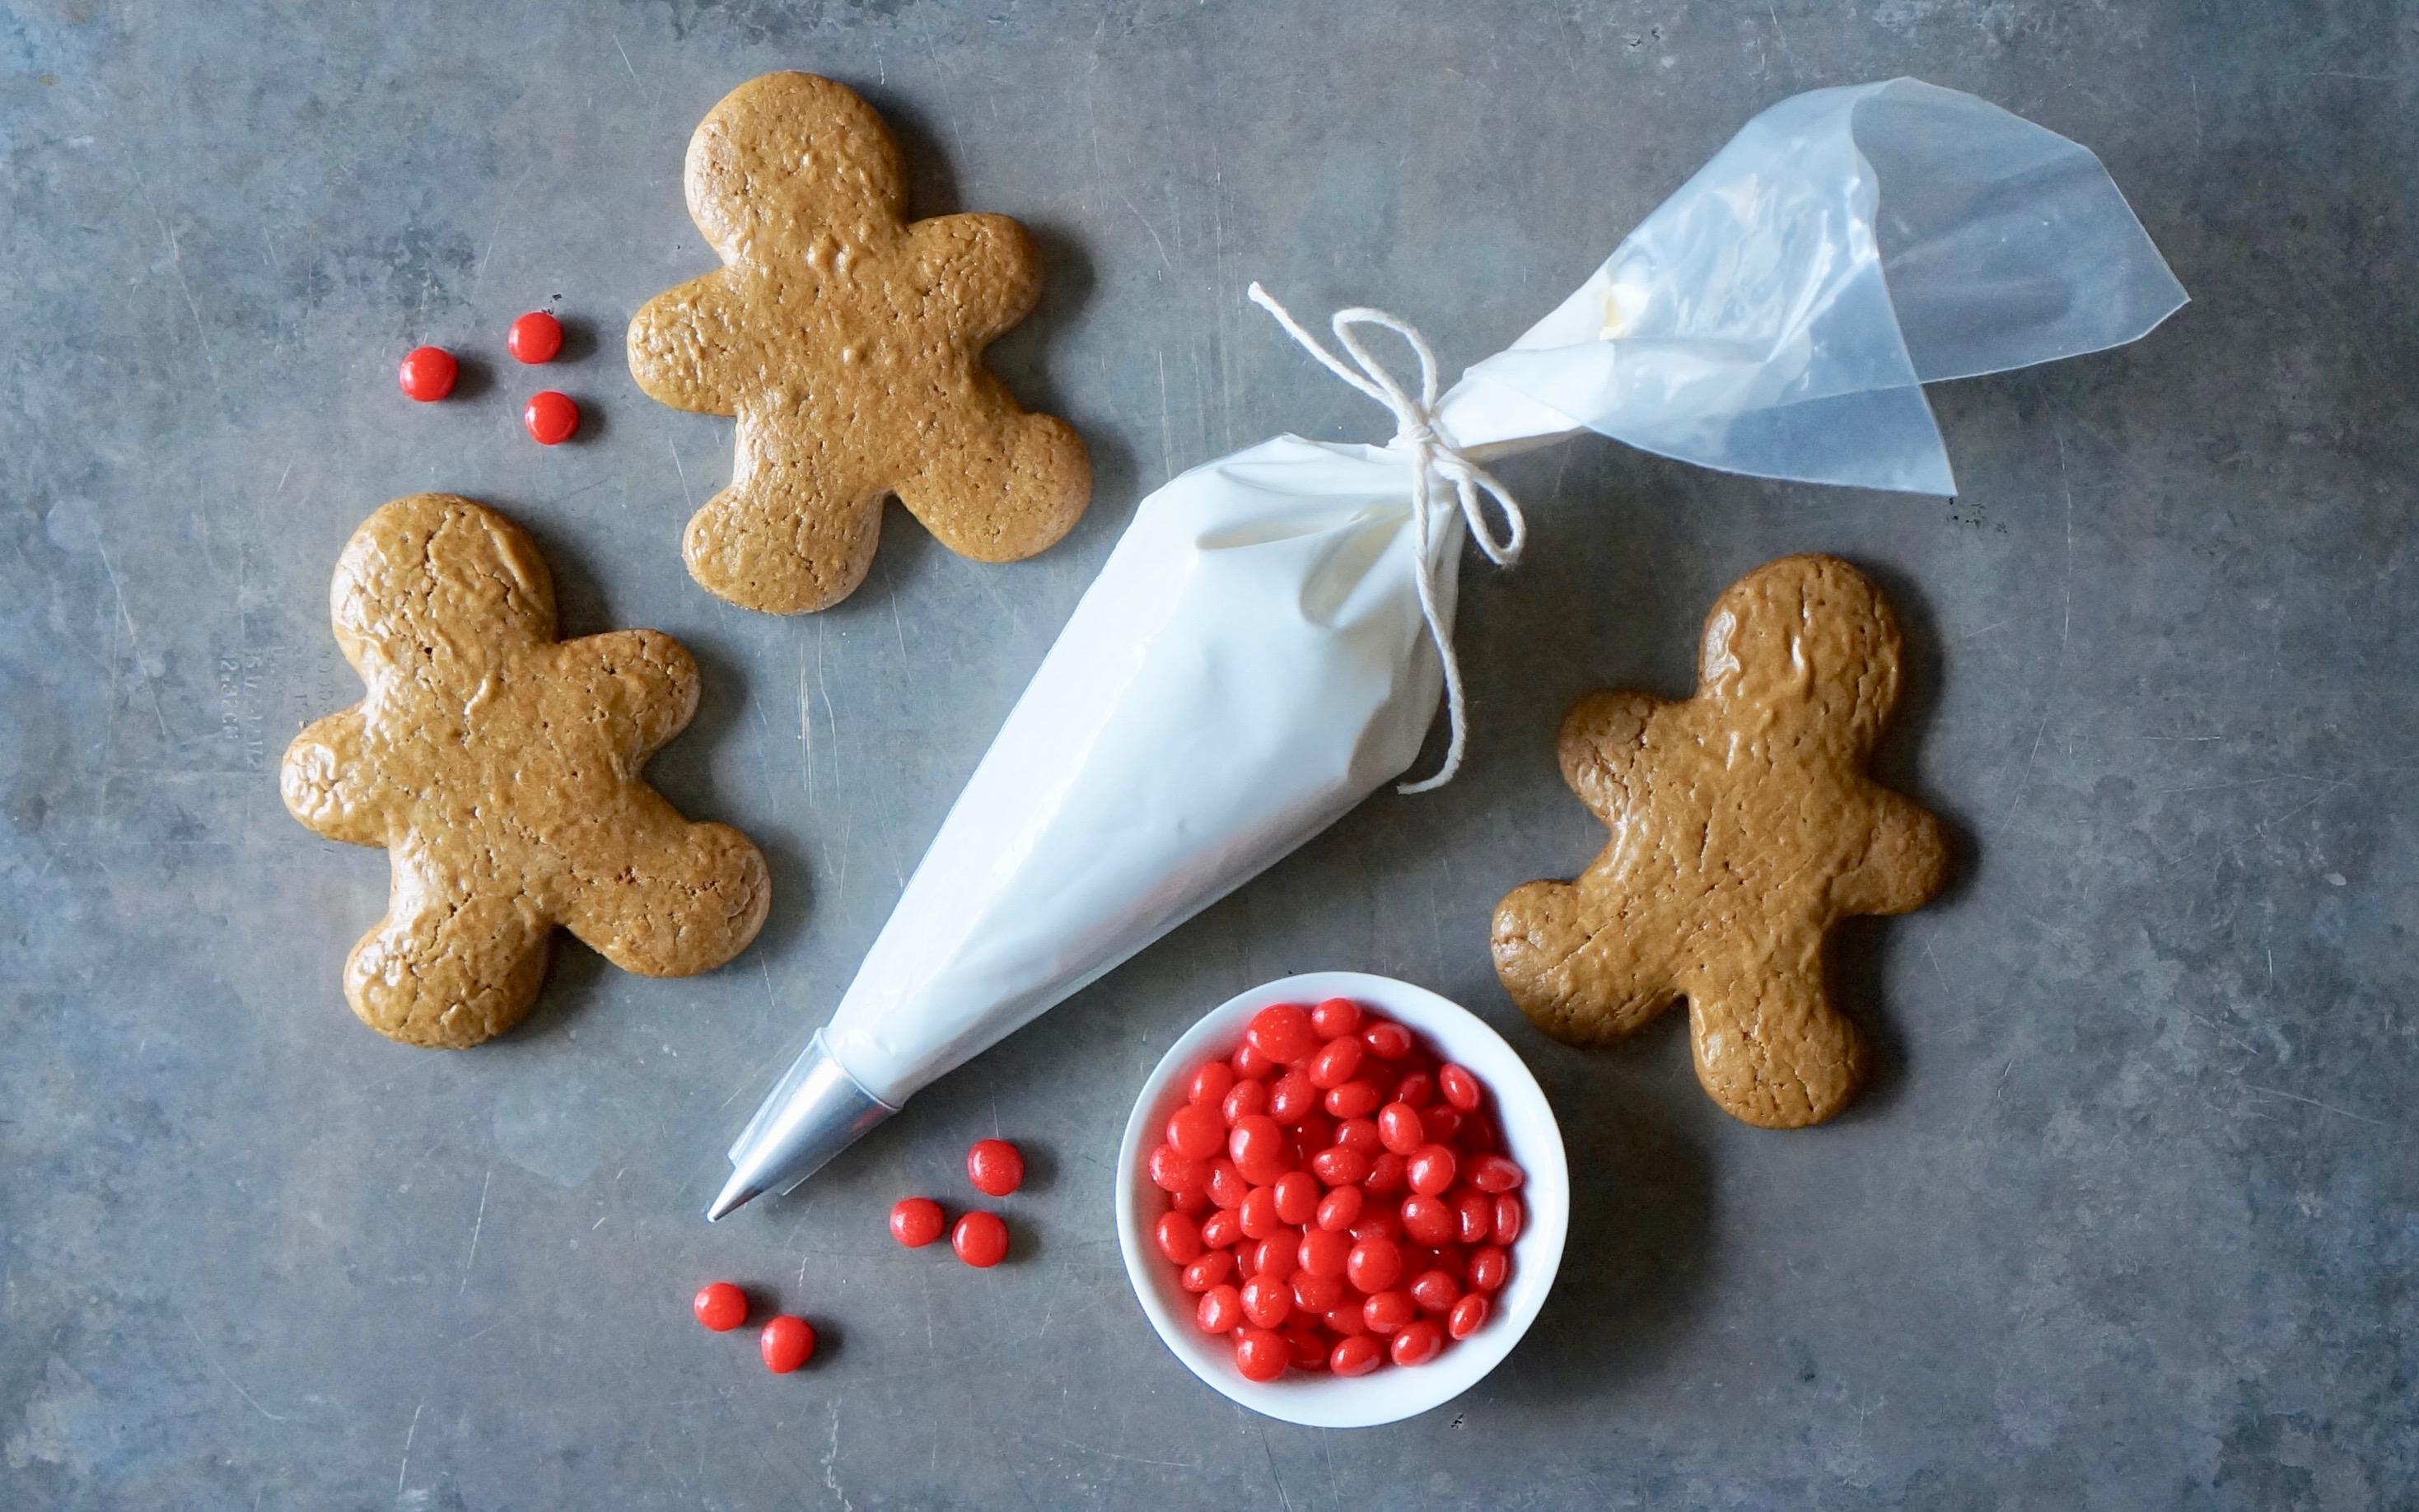 Decorating-Buttermilk-Gingerbread-Cookies-Rebecca-Gordon_Editor-In-Chief-Buttermilk-Lipstick-Southern-Hostess-RebeccaGordon-Pastry-Chef-Birmingham-Alabama